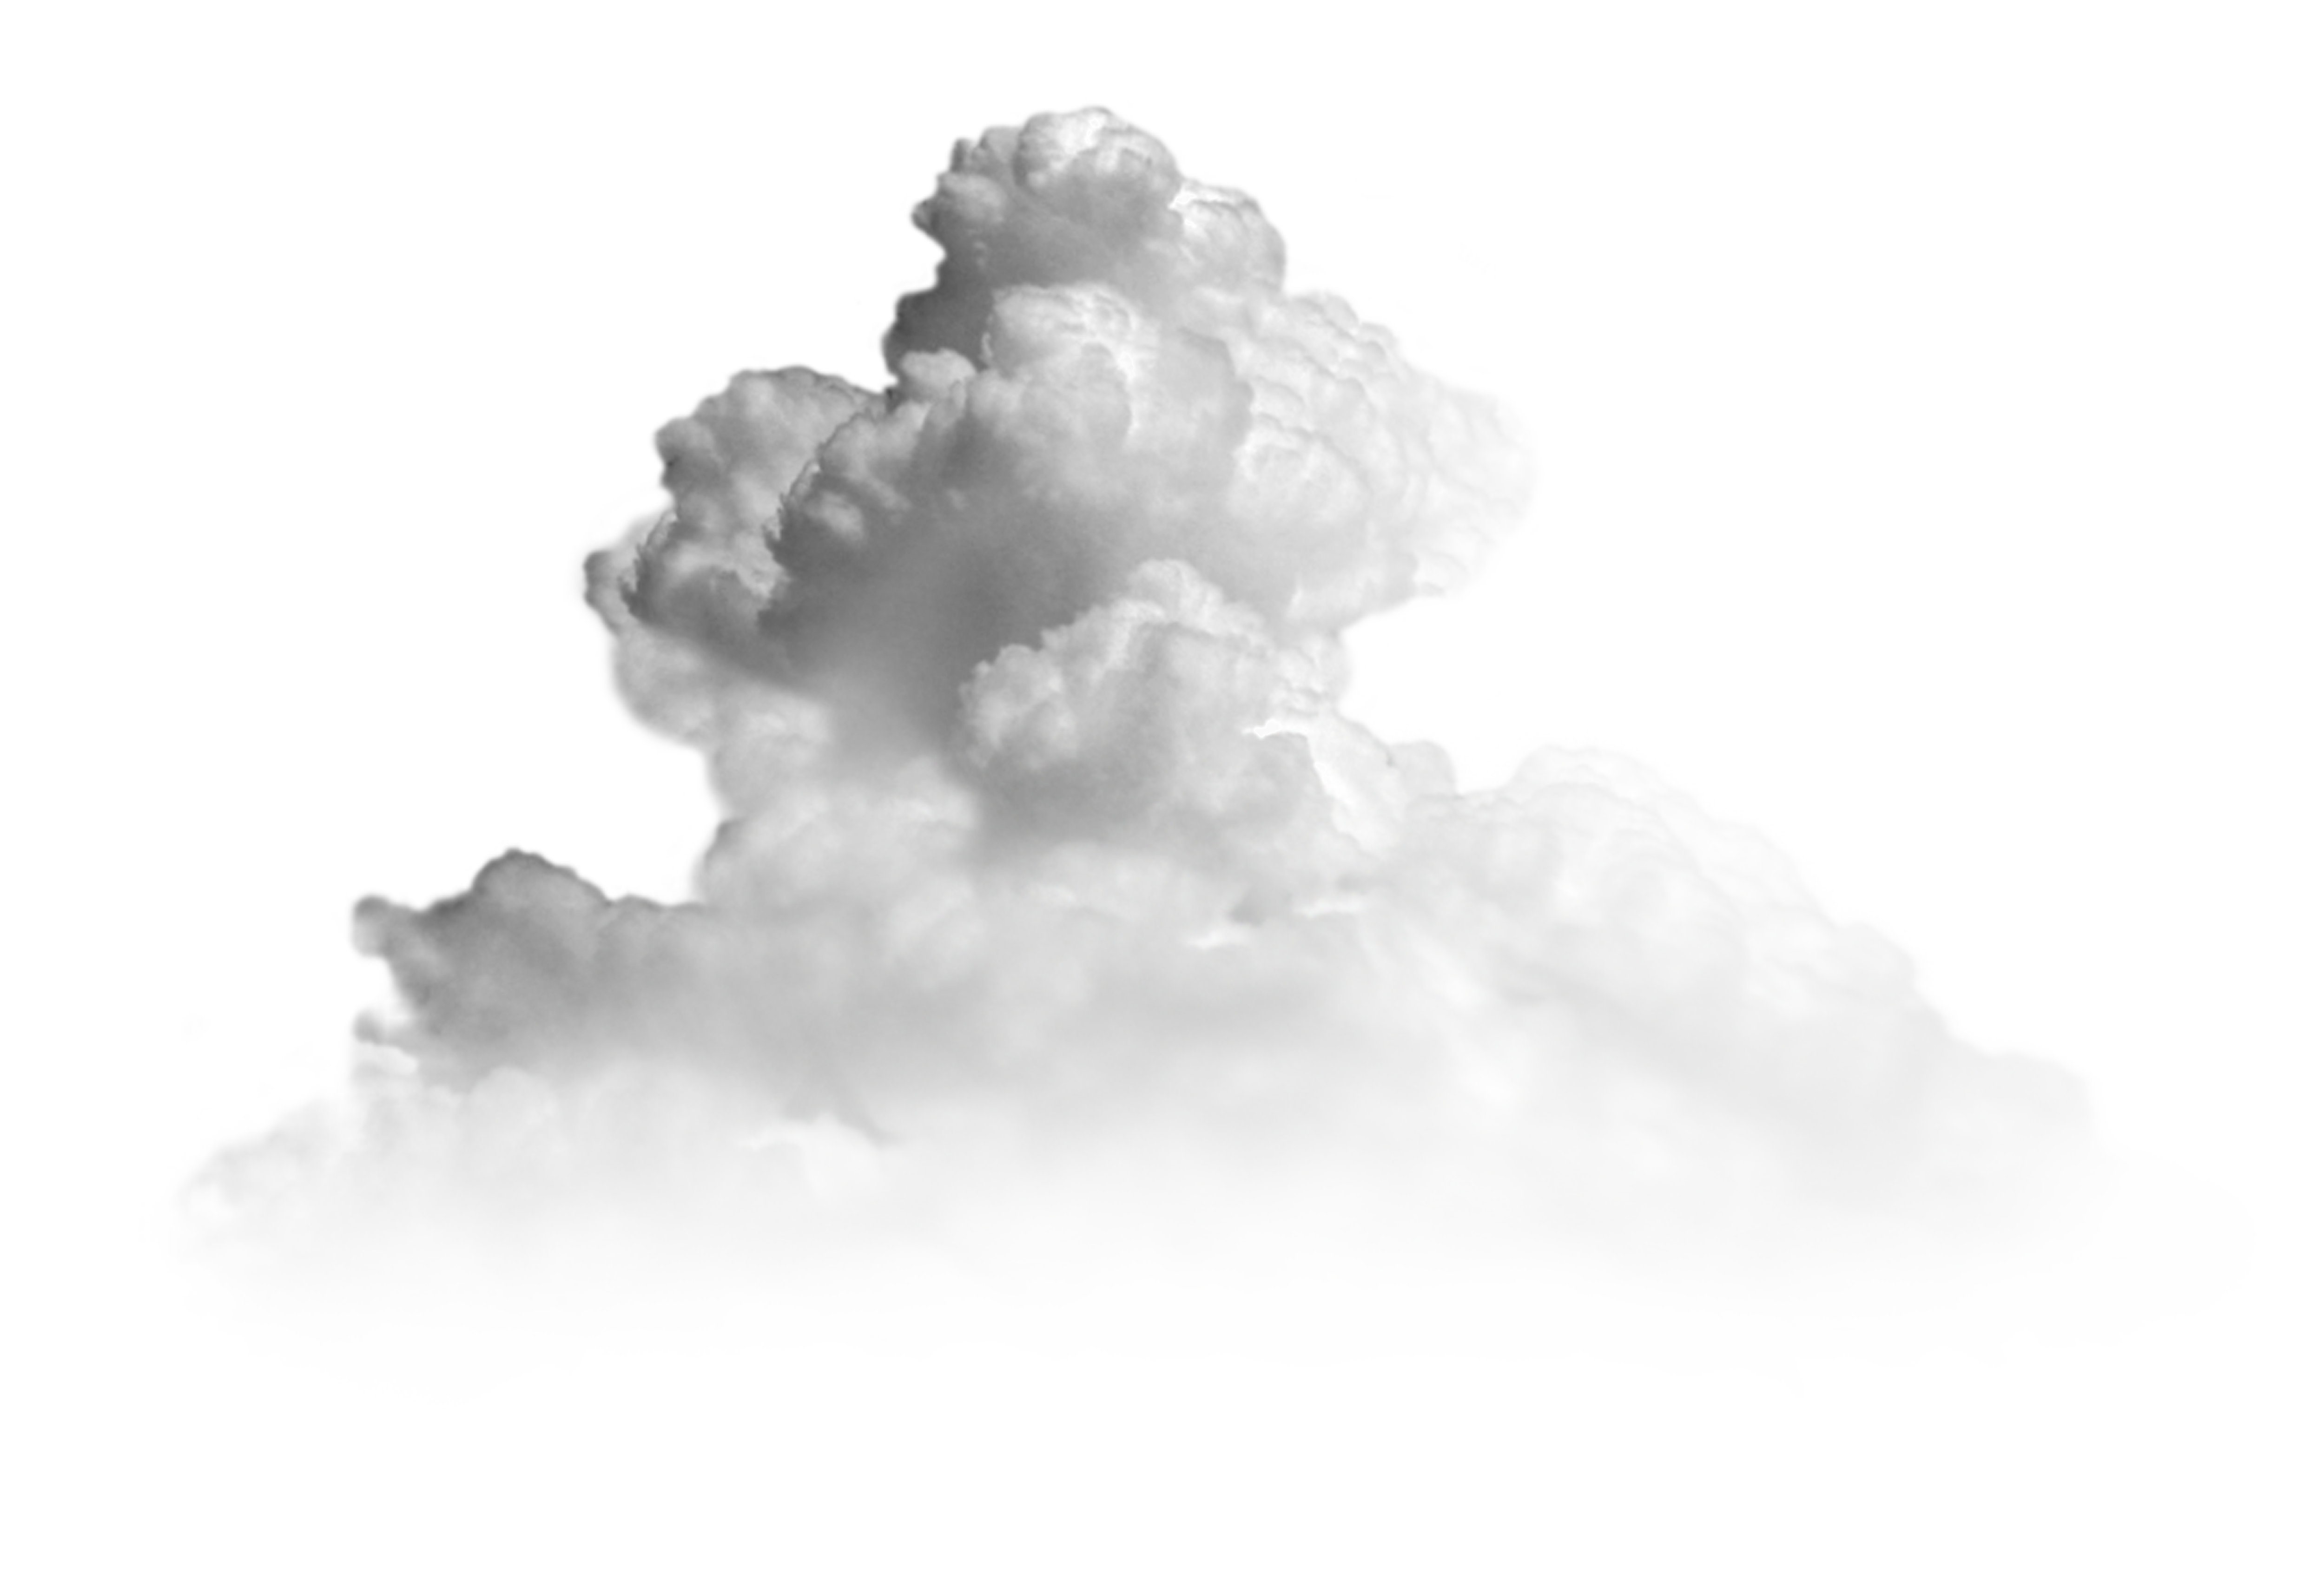 Ash Cloud clipart #5, Download drawings